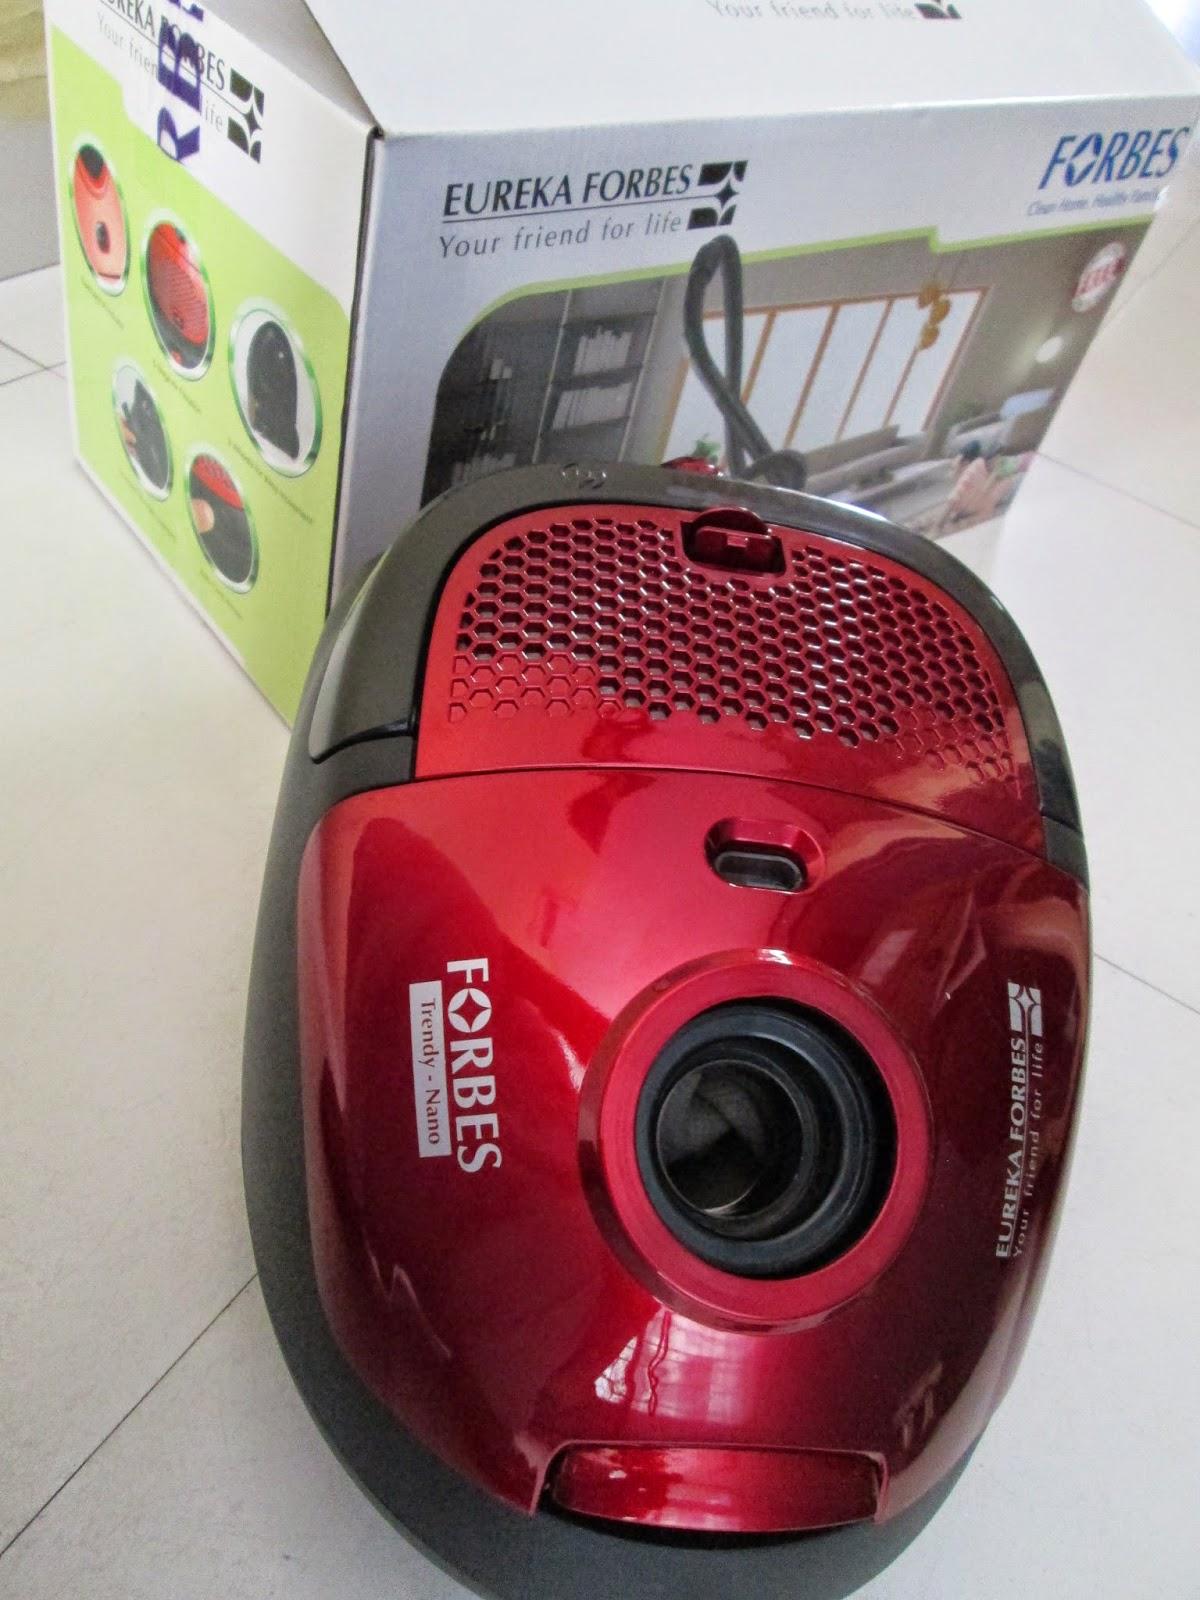 Eureka Forbes Trendy Nano Vacuum Cleaner